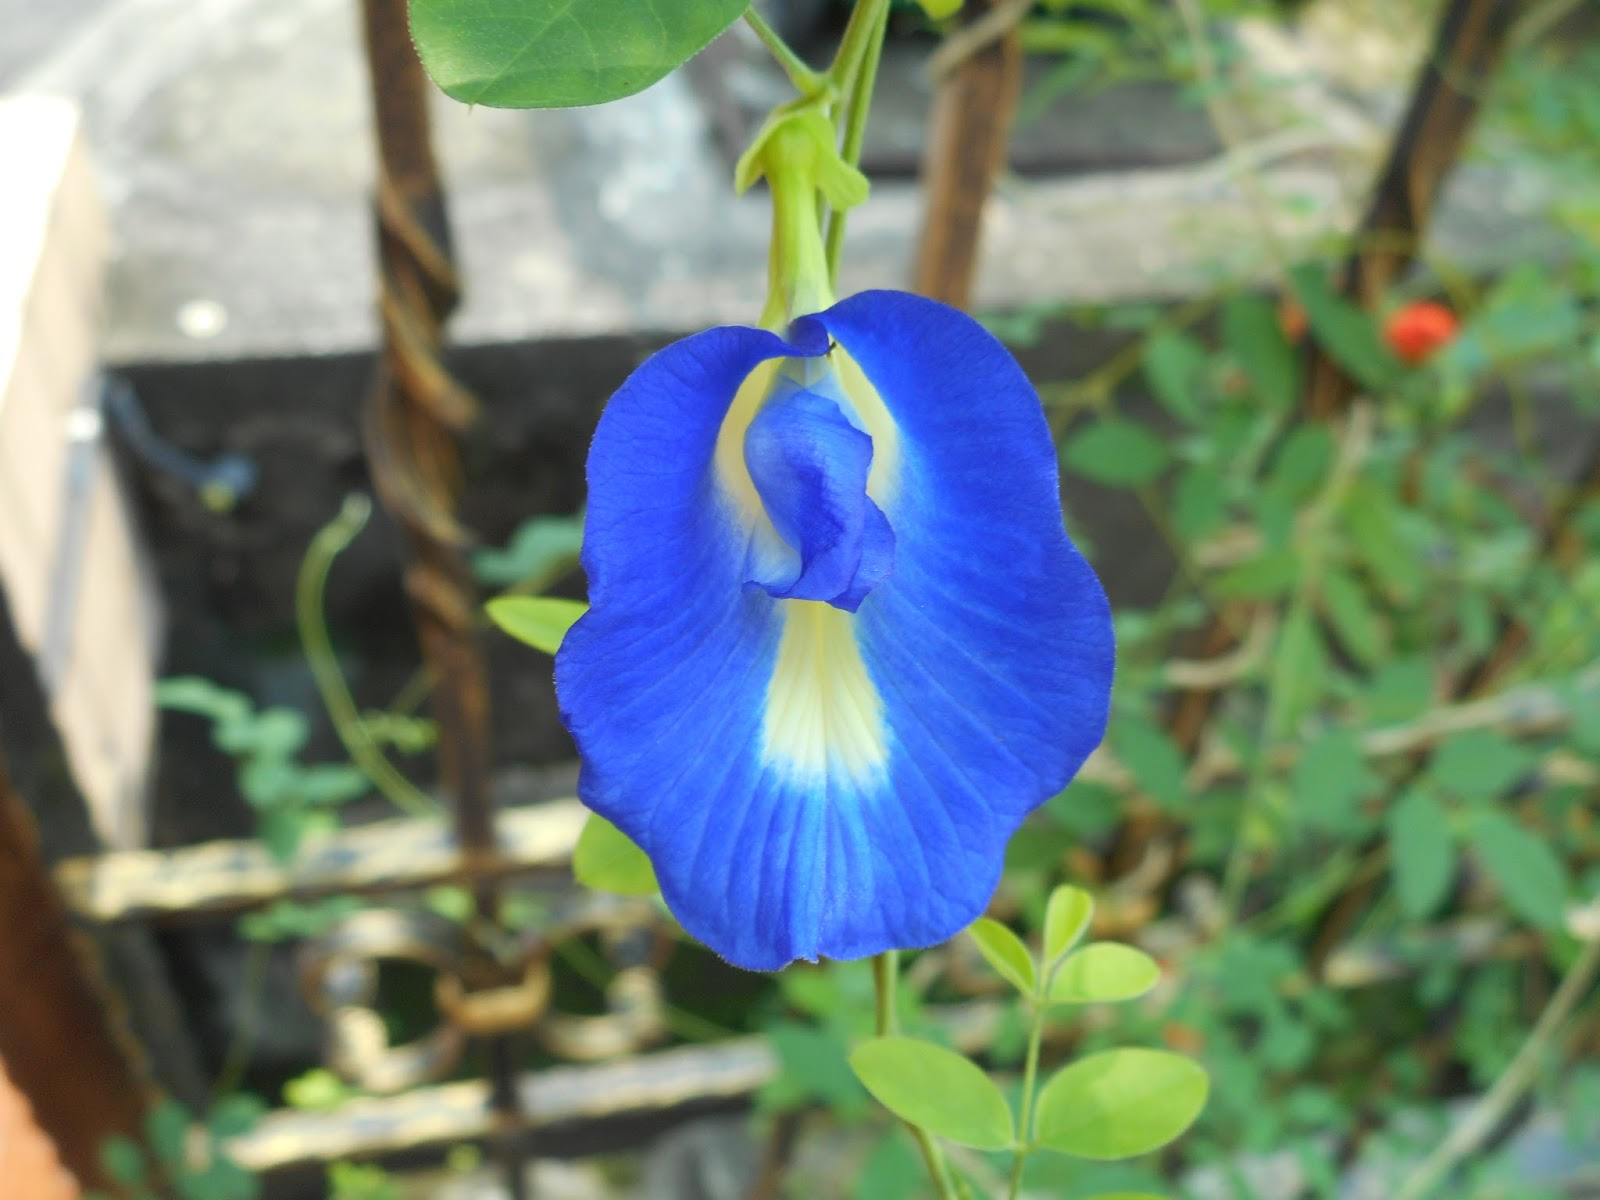 Refreshing blue pea flower tea with lemon the hedgehog knows refreshing blue pea flower tea with lemon izmirmasajfo Images